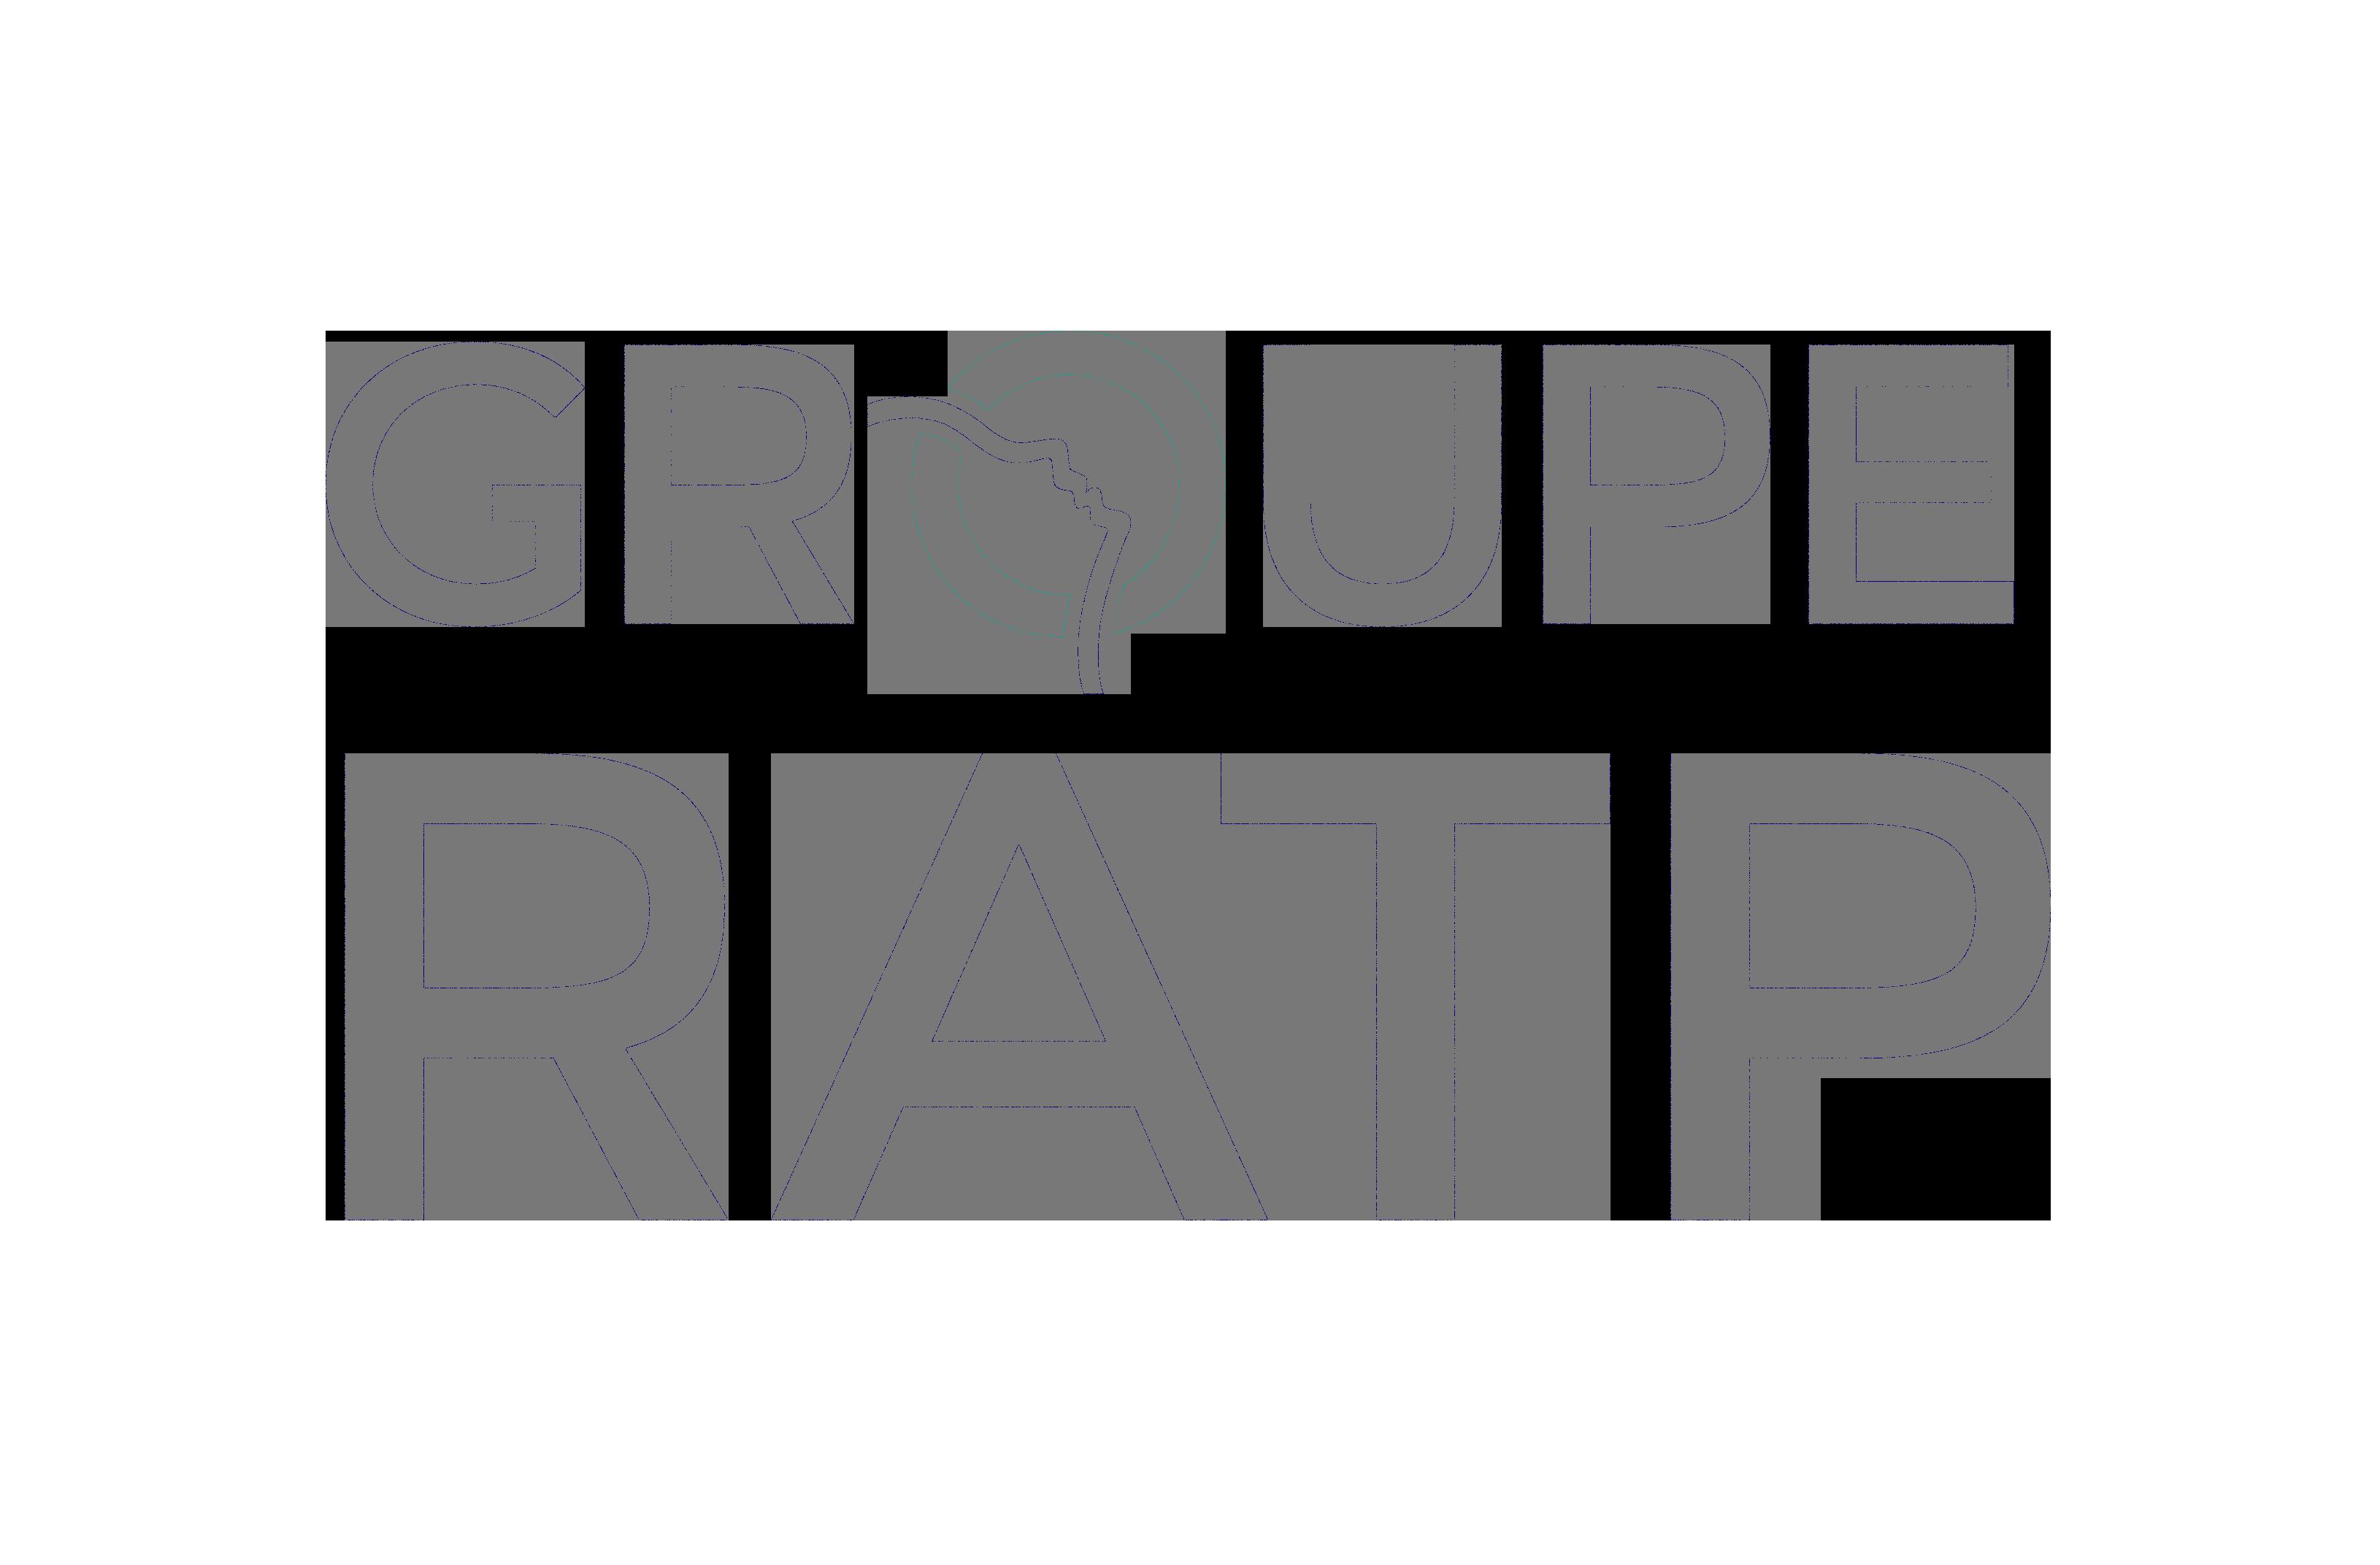 RVB_GROUPE_RATP_HD grey